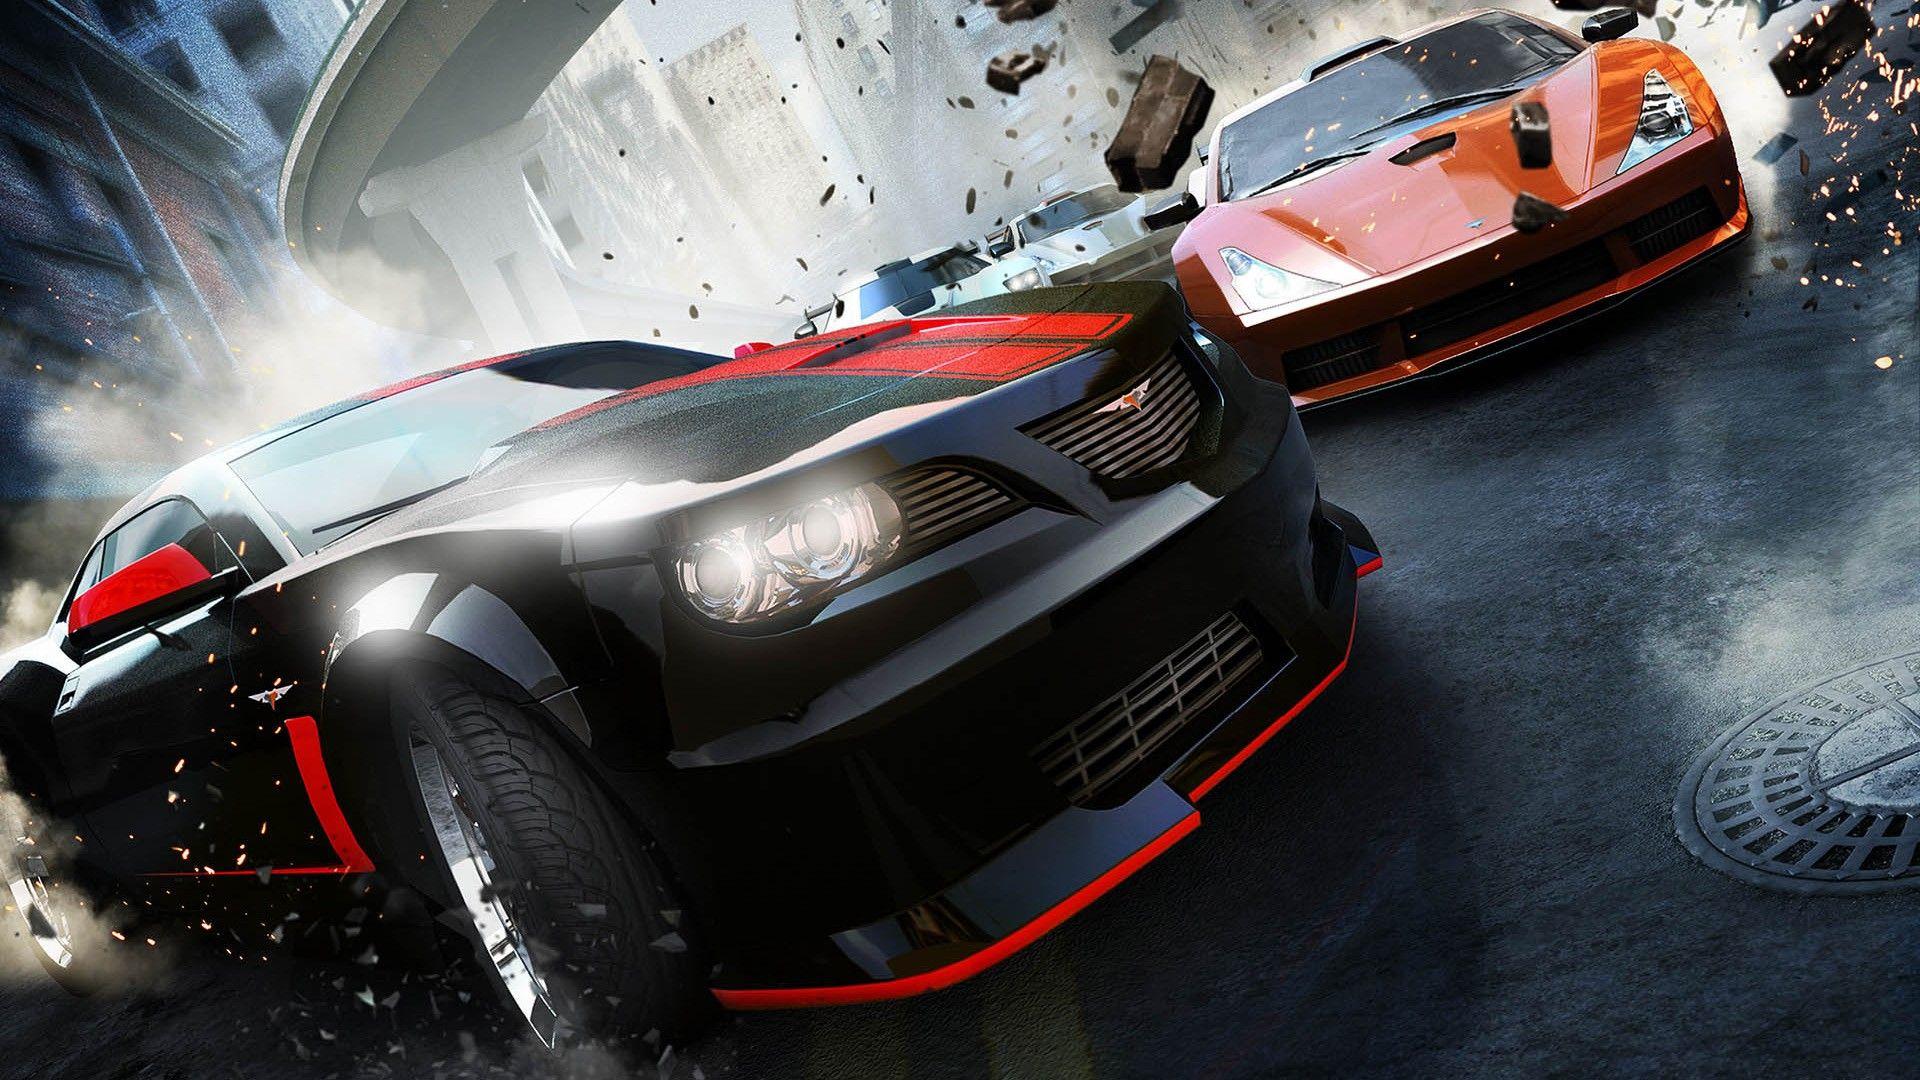 Ridge Racer Unbounded Wallpaper Ridge Racer Car Wallpapers Car Games